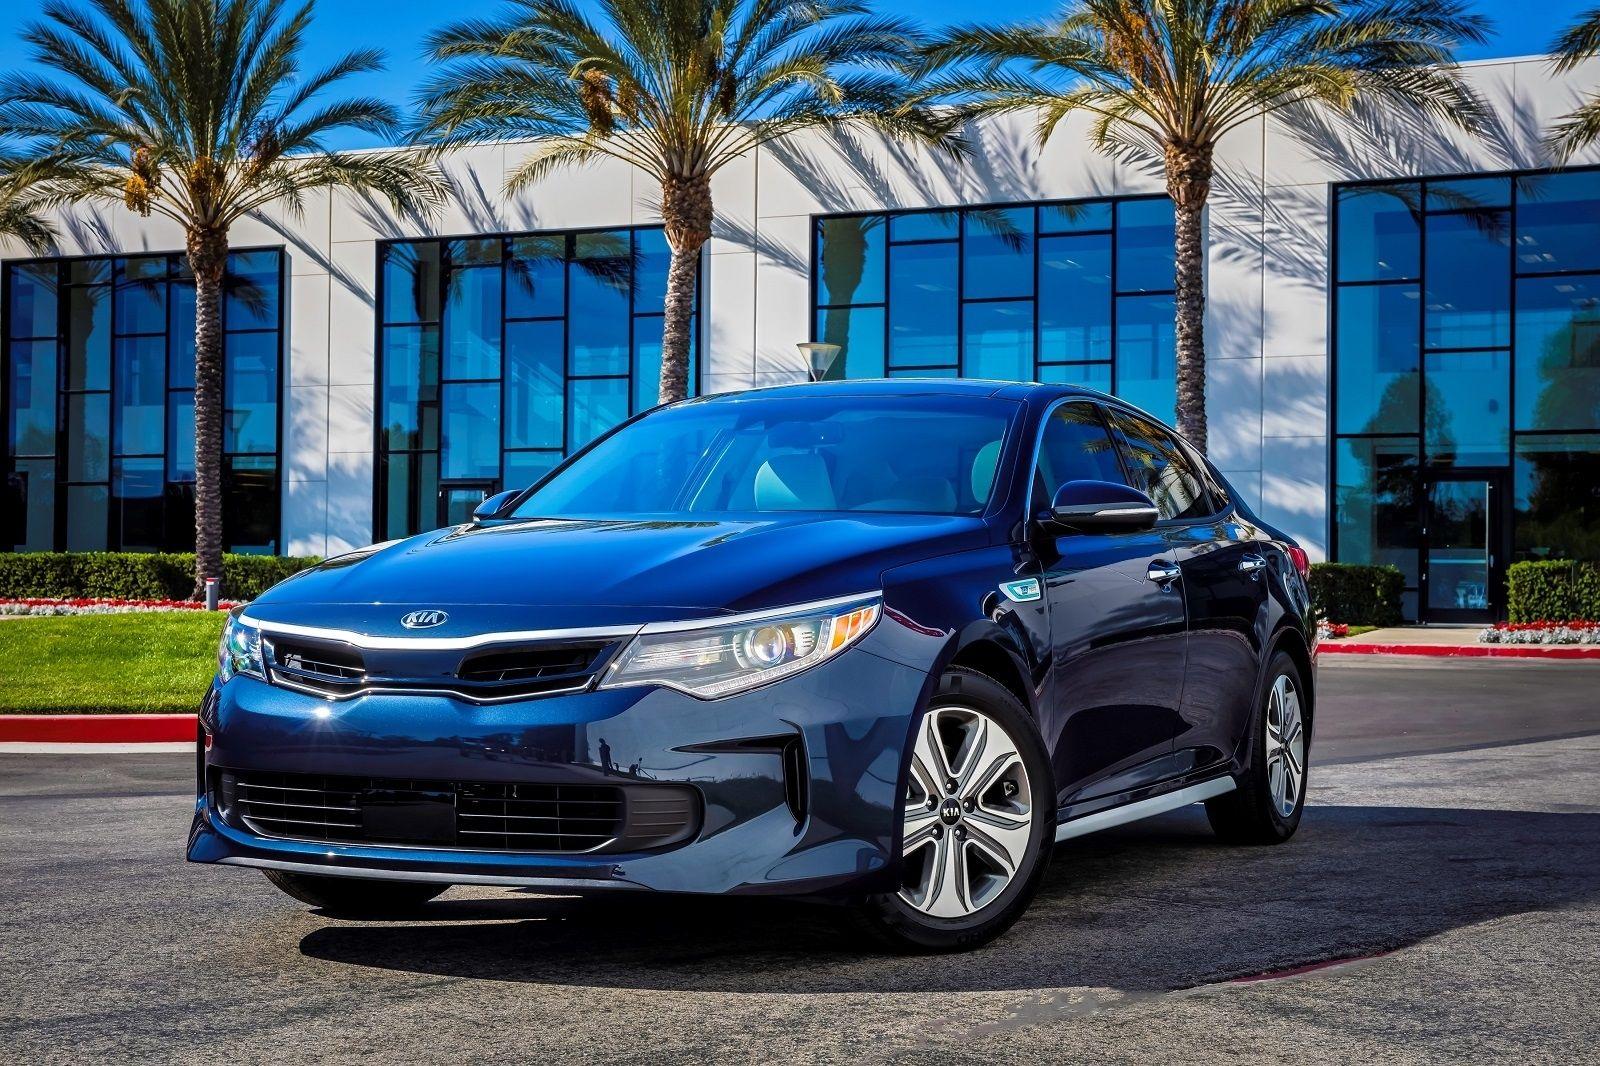 2020 Kia Optima Hybrid Release Date Price And Review Kia Optima Kia Motors America Kia Motors